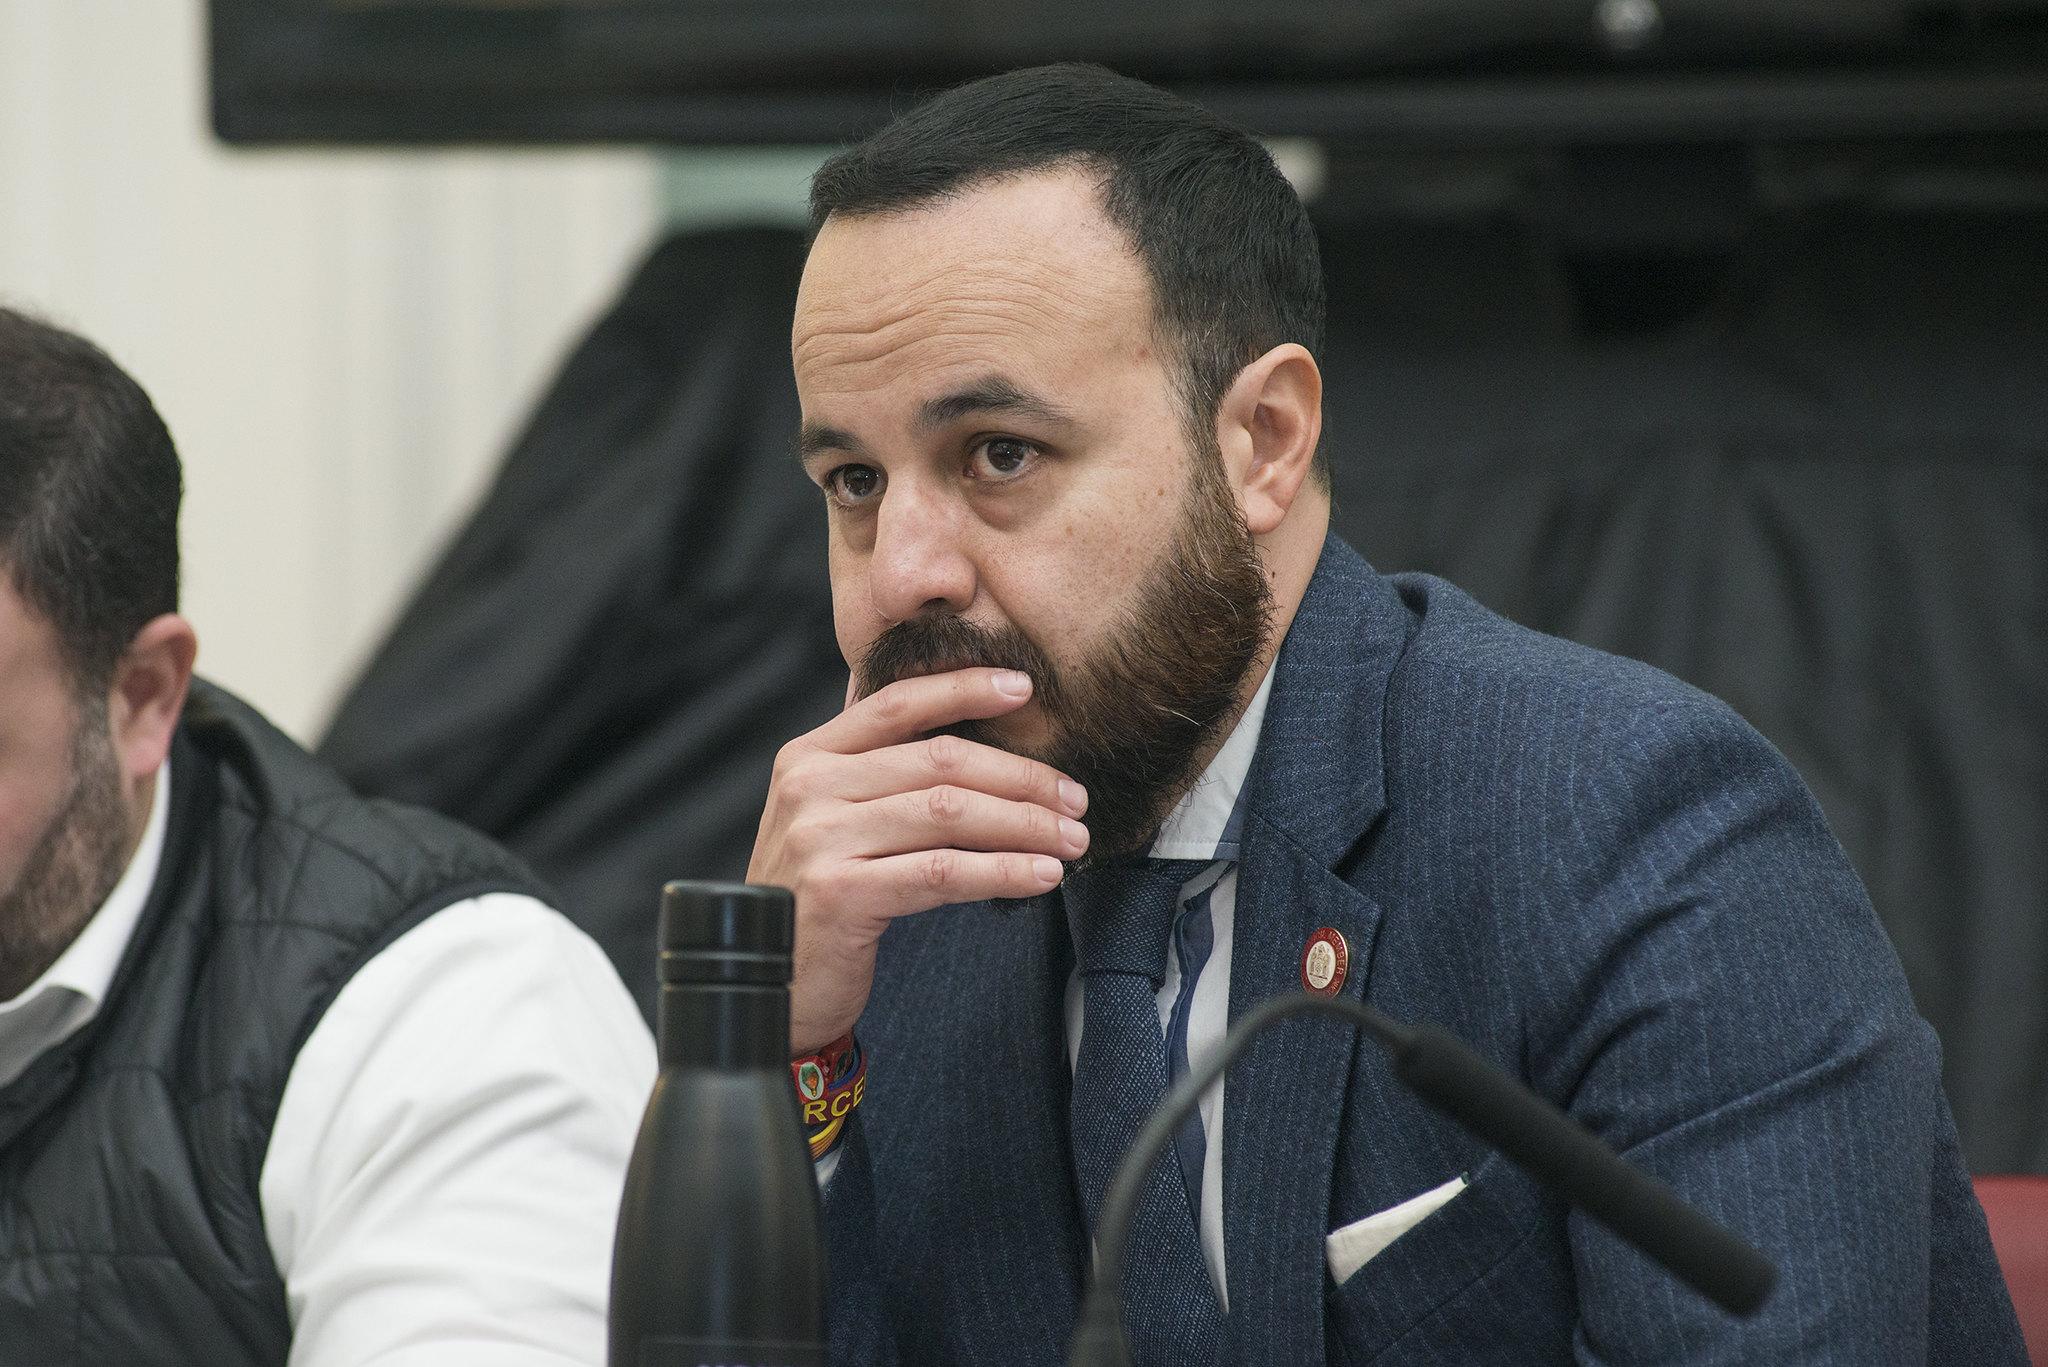 New York City Councilmember Francisco Moya